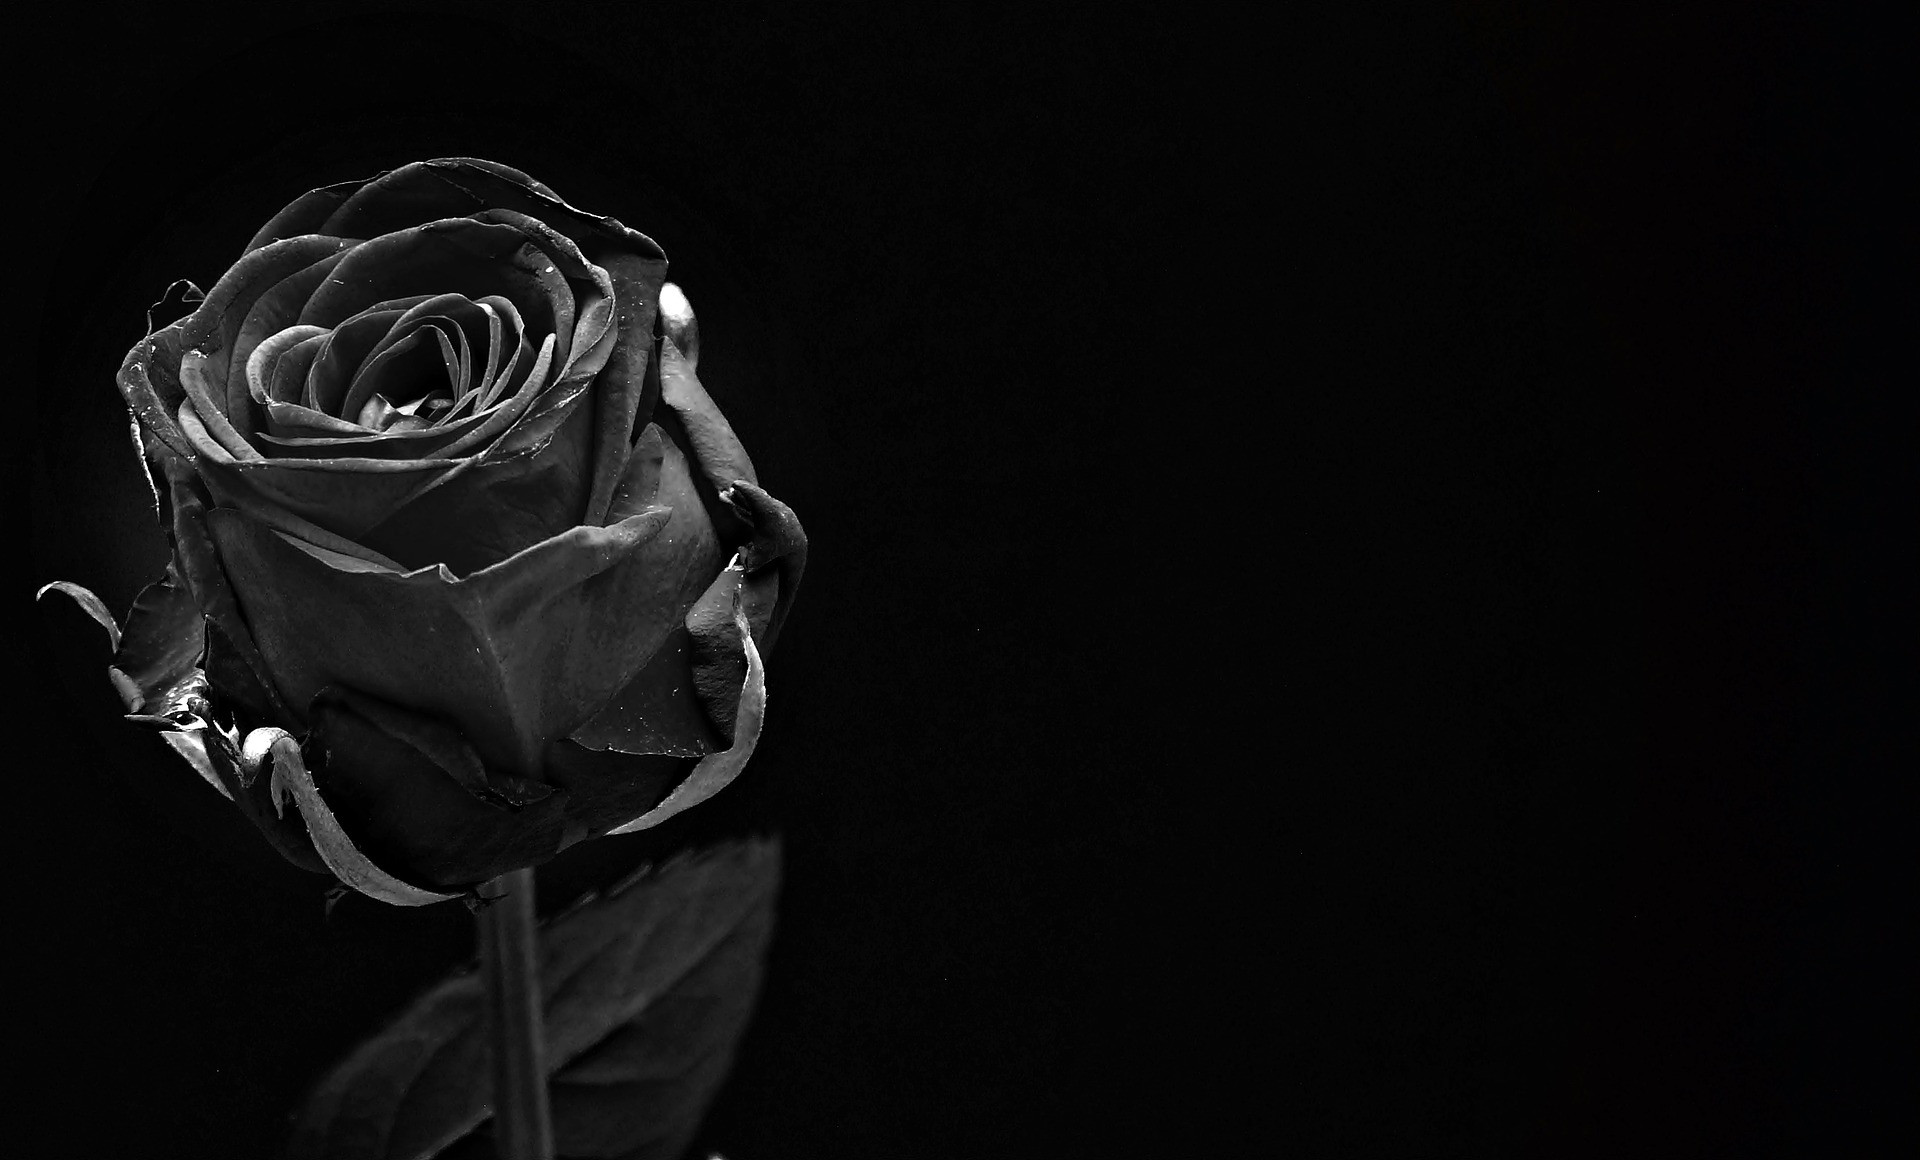 Trauer schwarze Rose